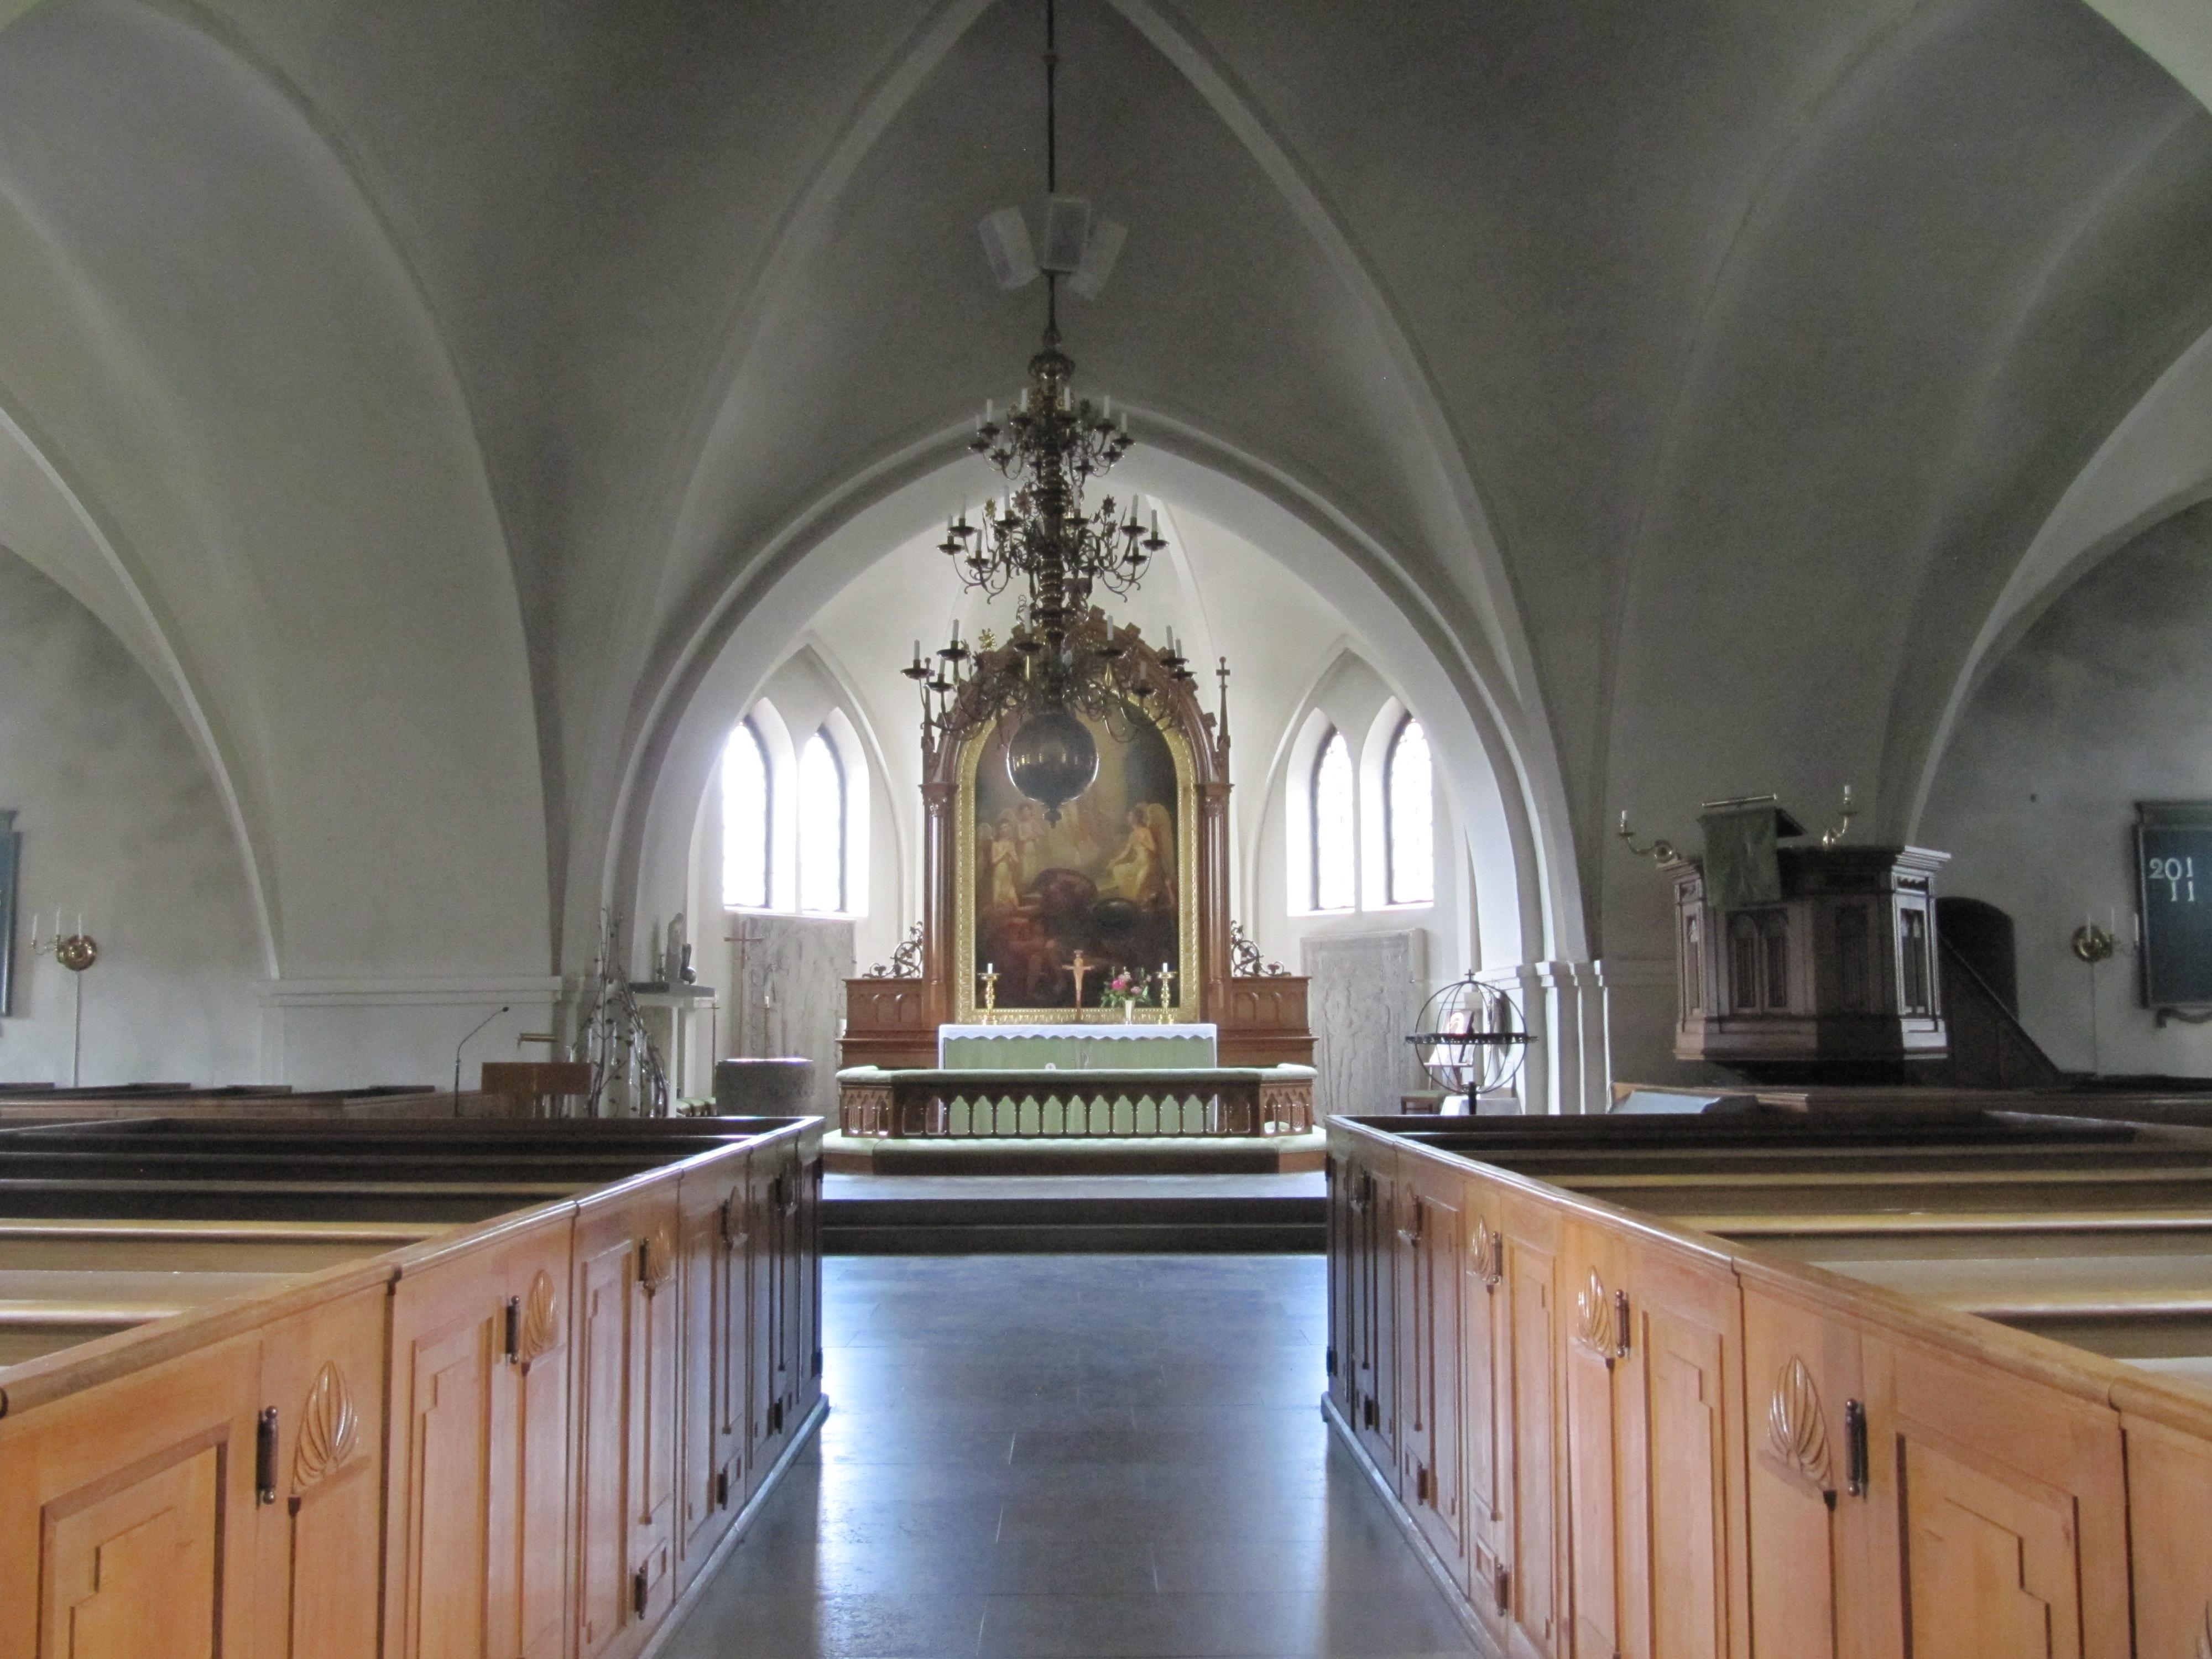 A. Strvelstorp - satisfaction-survey.net